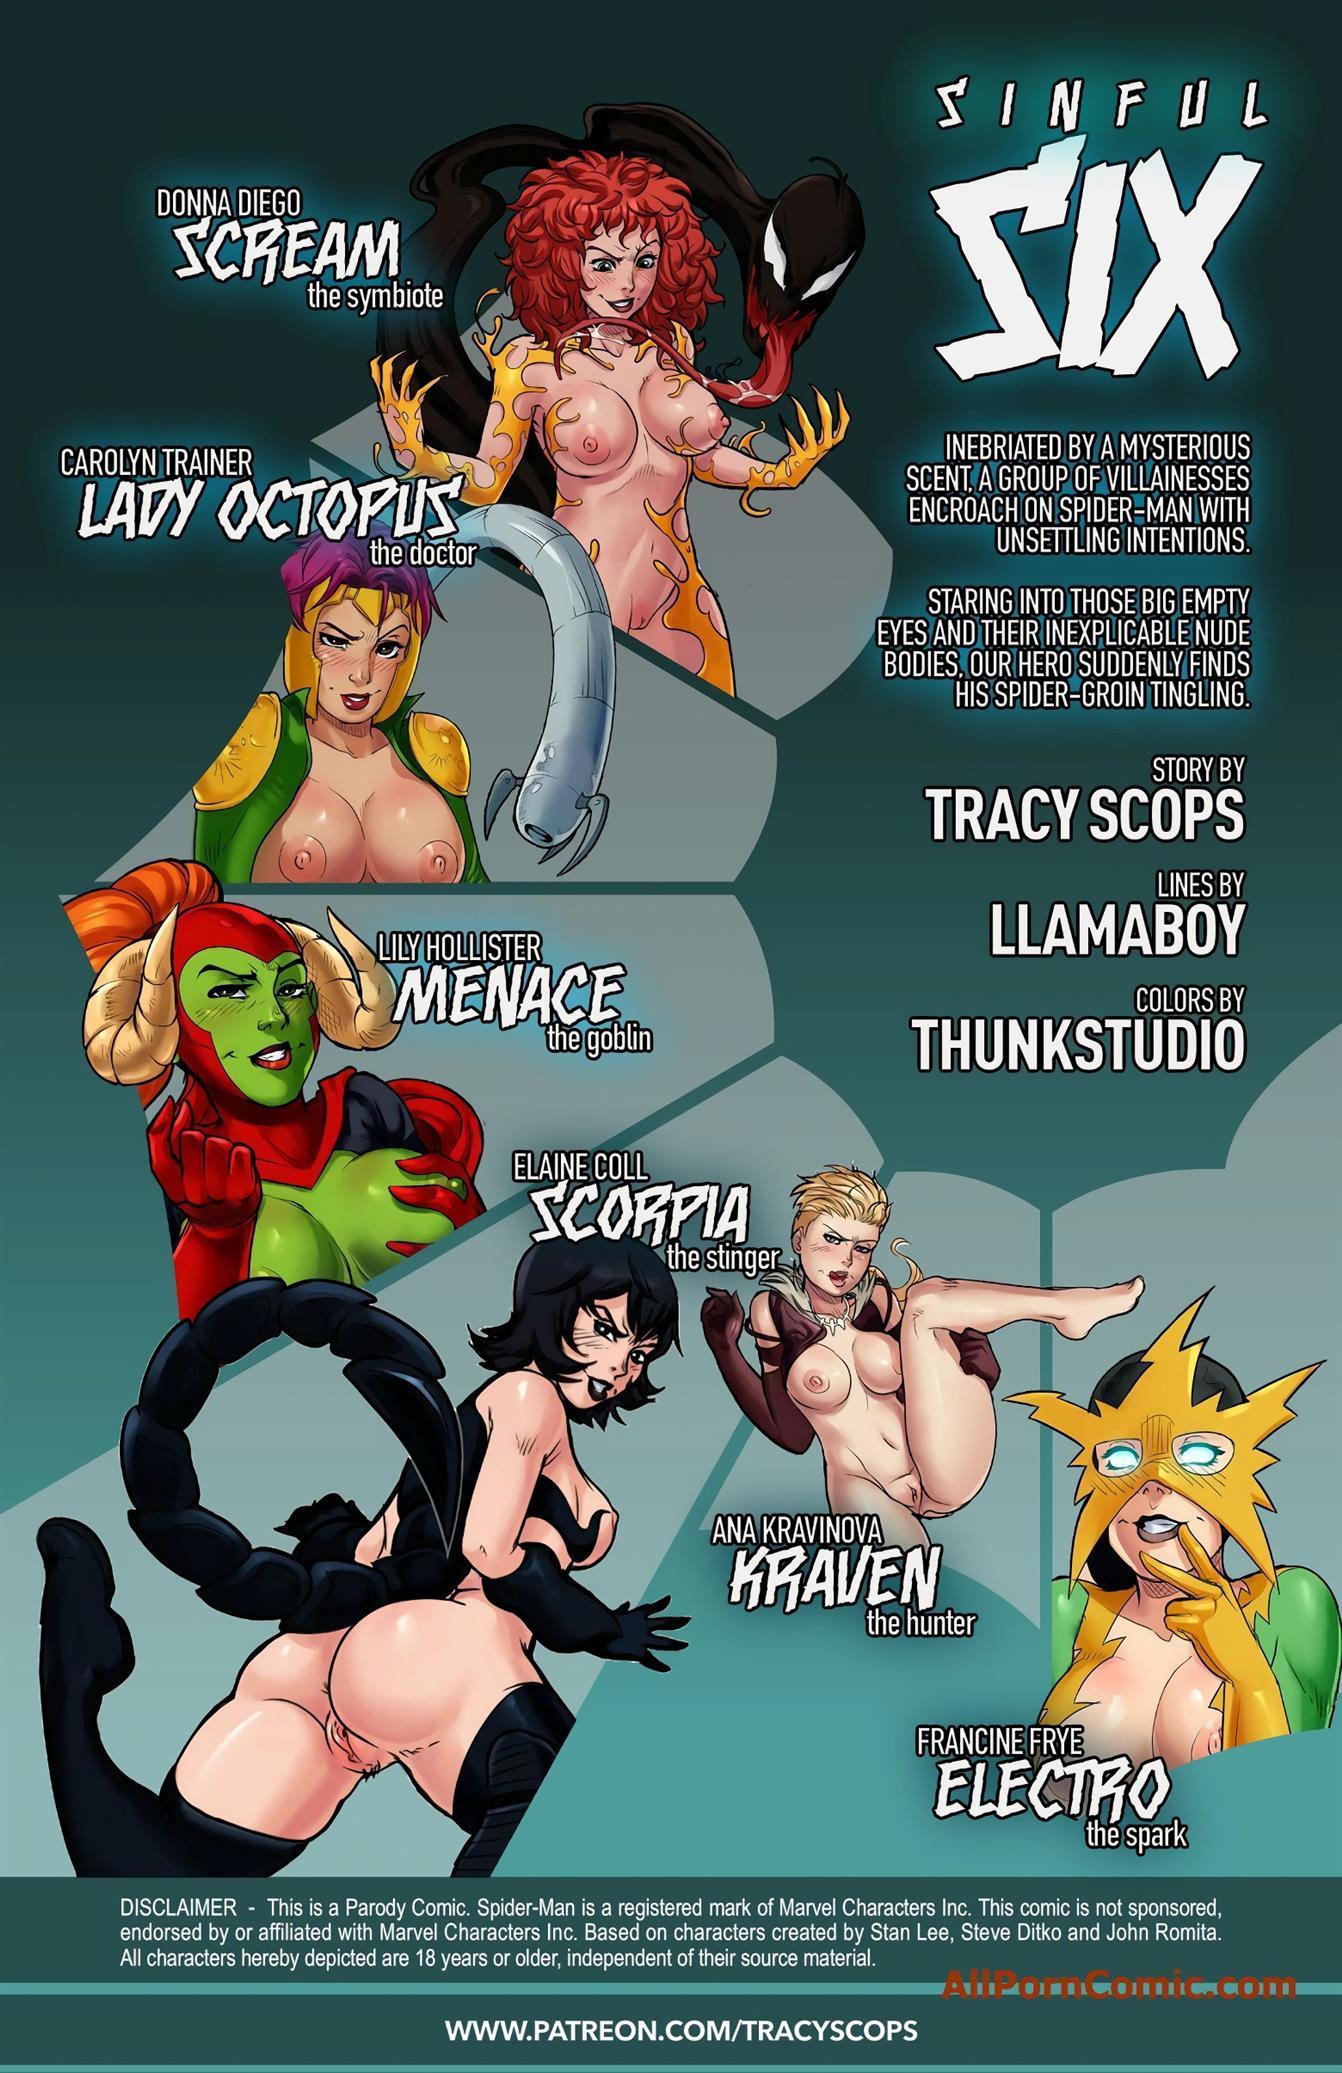 Sinful Six (Spider-Man) [Tracy Scops] - Foto 2